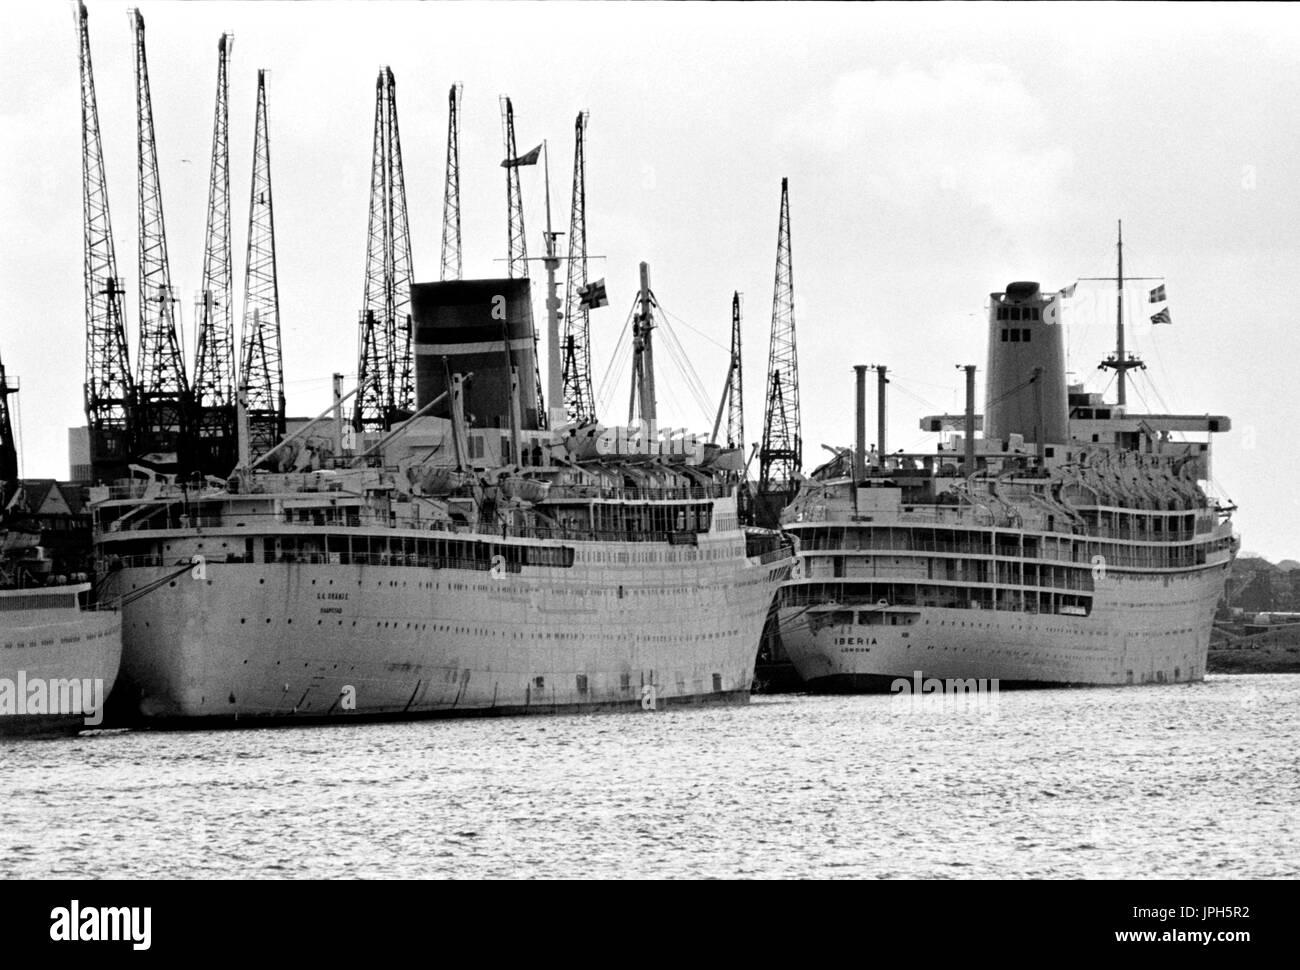 AJAXNETPHOTO. 1973. SOUTHAMPTON, ENGLAND. - END OF AN ERA - PASSENGER LINERS S.A. ORANJE (L) AND IBERIA (R) MOORED AT WESTERN DOCKS. PHOTO:JONATHAN EASTLAND/AJAX REF:1973_7 - Stock Image